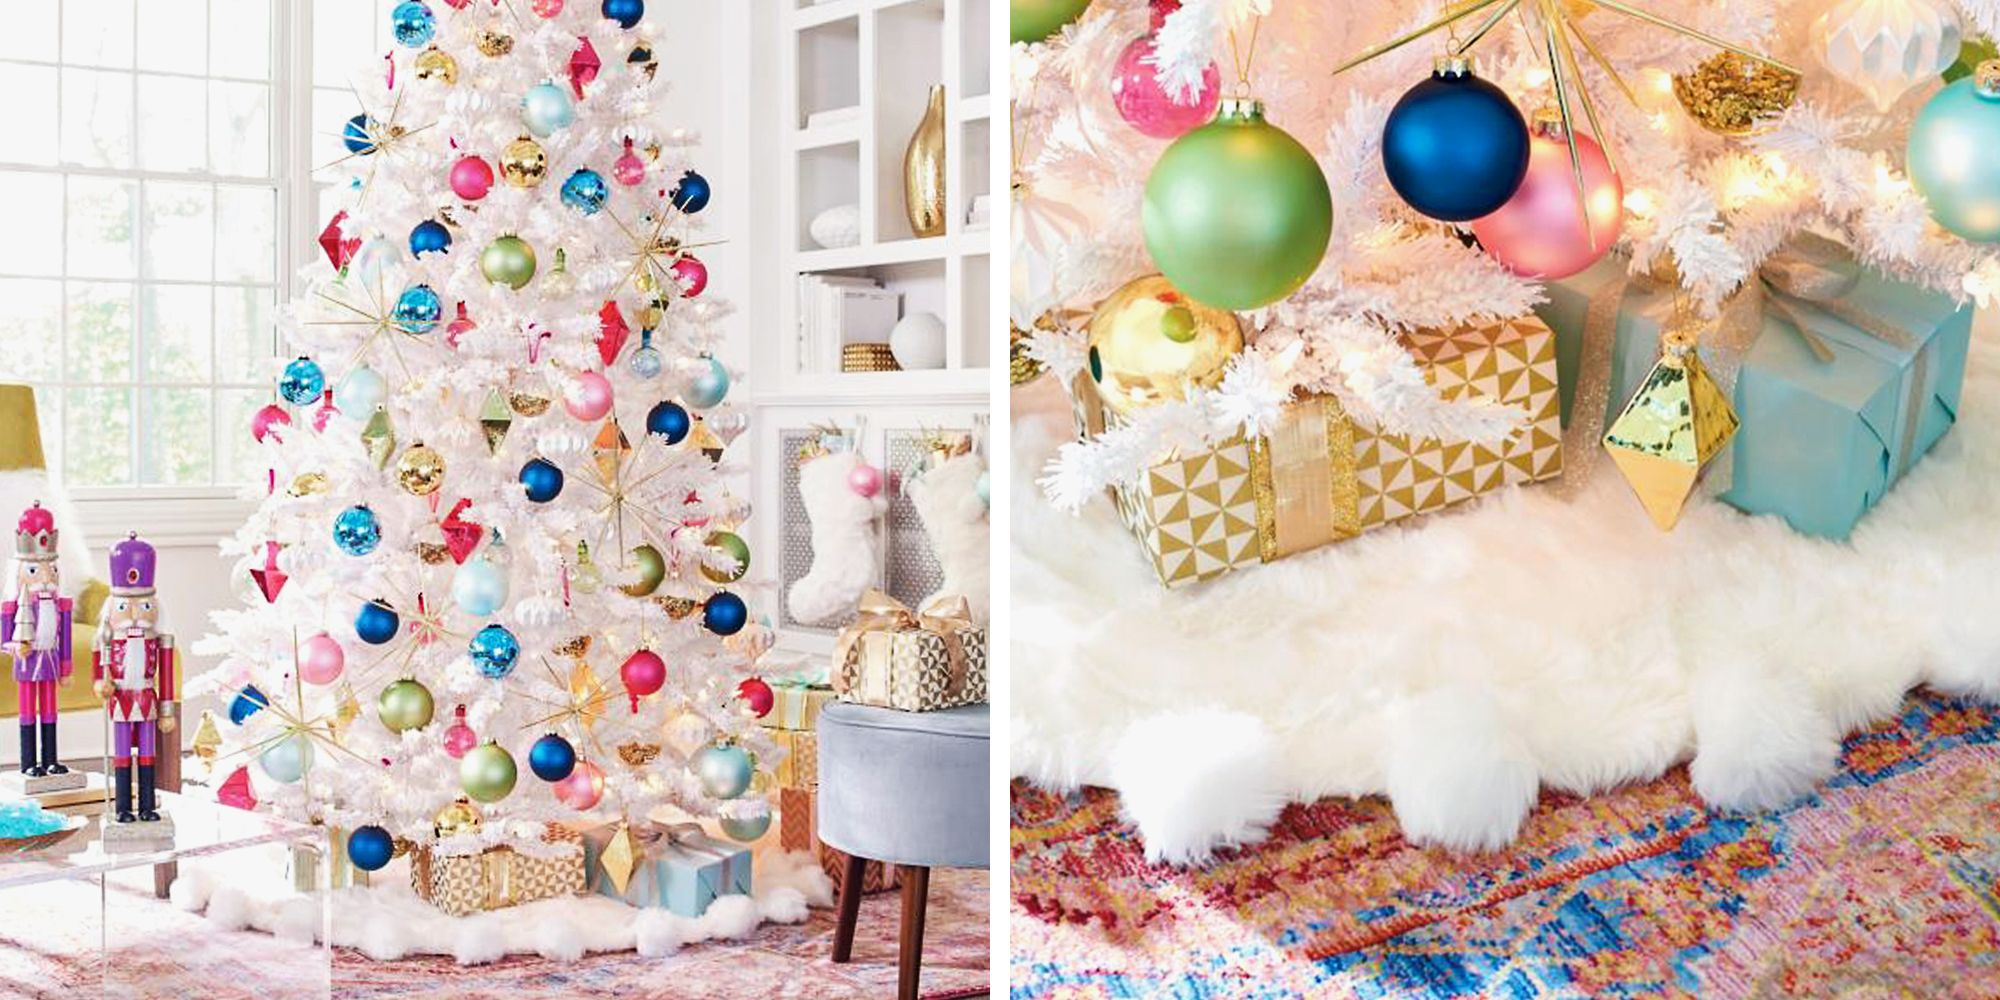 10 Best Christmas Tree Skirts for 2018 - Elegant White, Gold & Red Tree Skirts